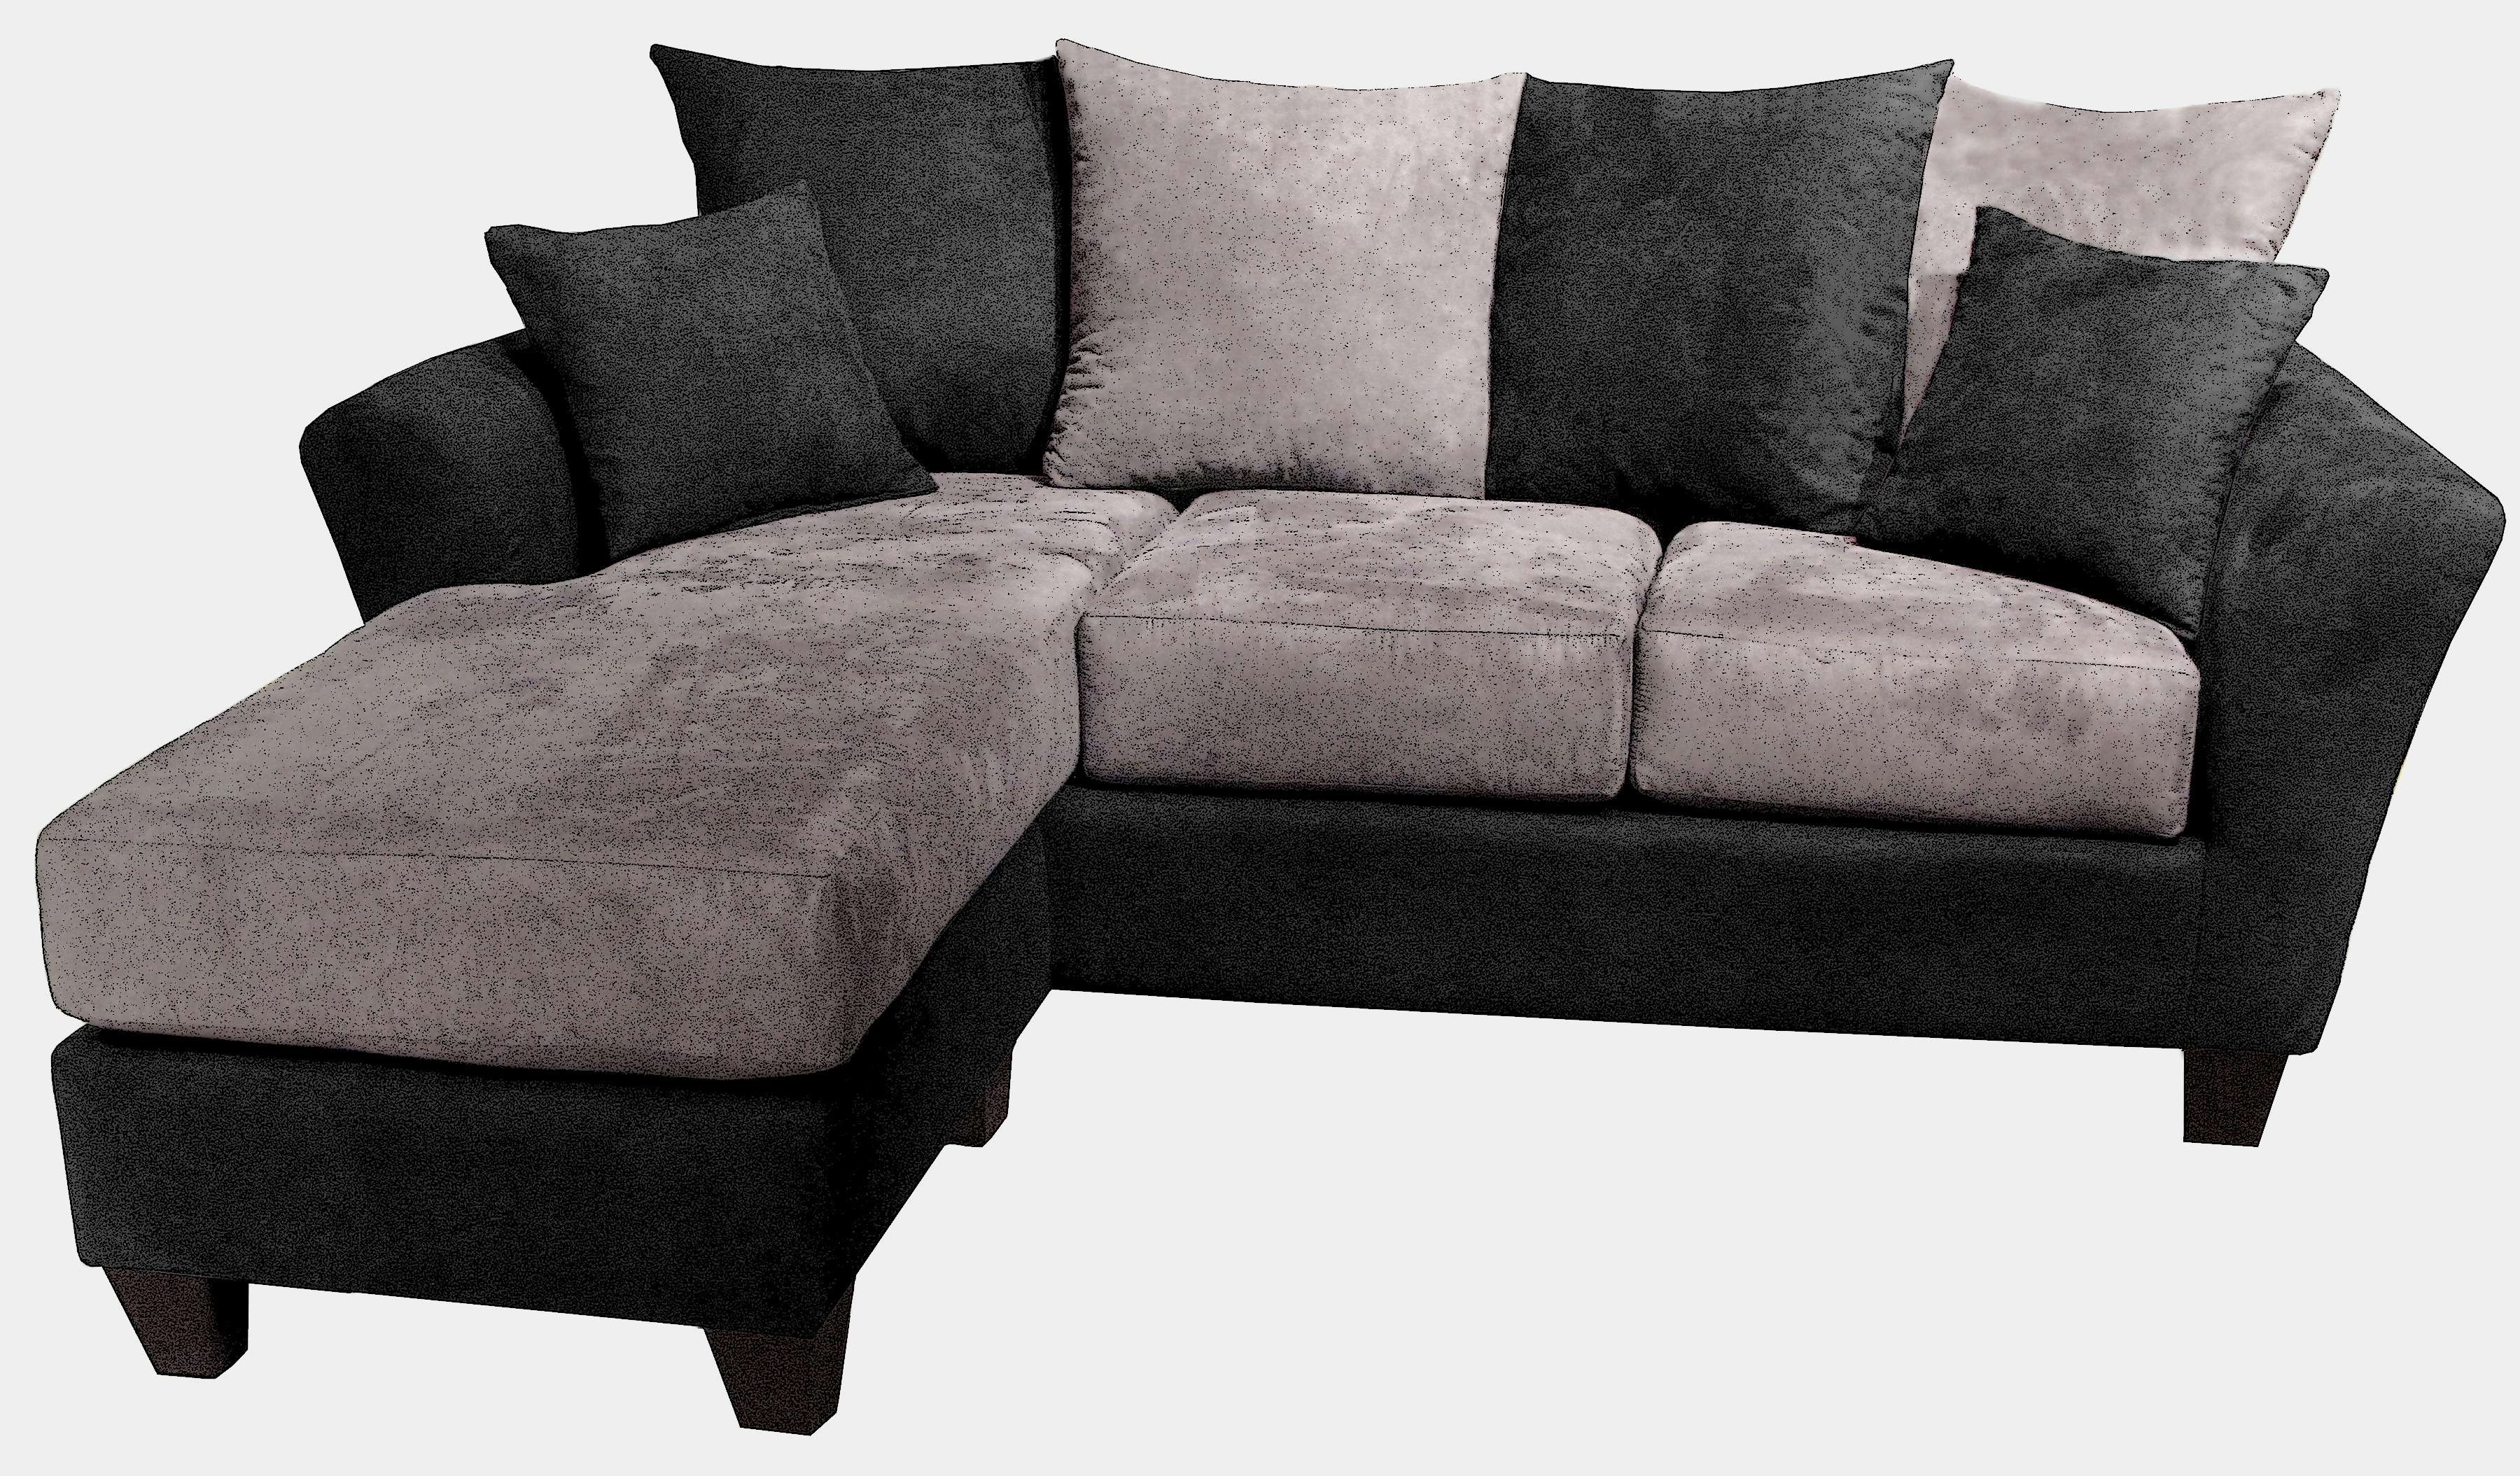 furniture mattress discount king 2750 paxton st harrisburg pa 17111. Black Bedroom Furniture Sets. Home Design Ideas